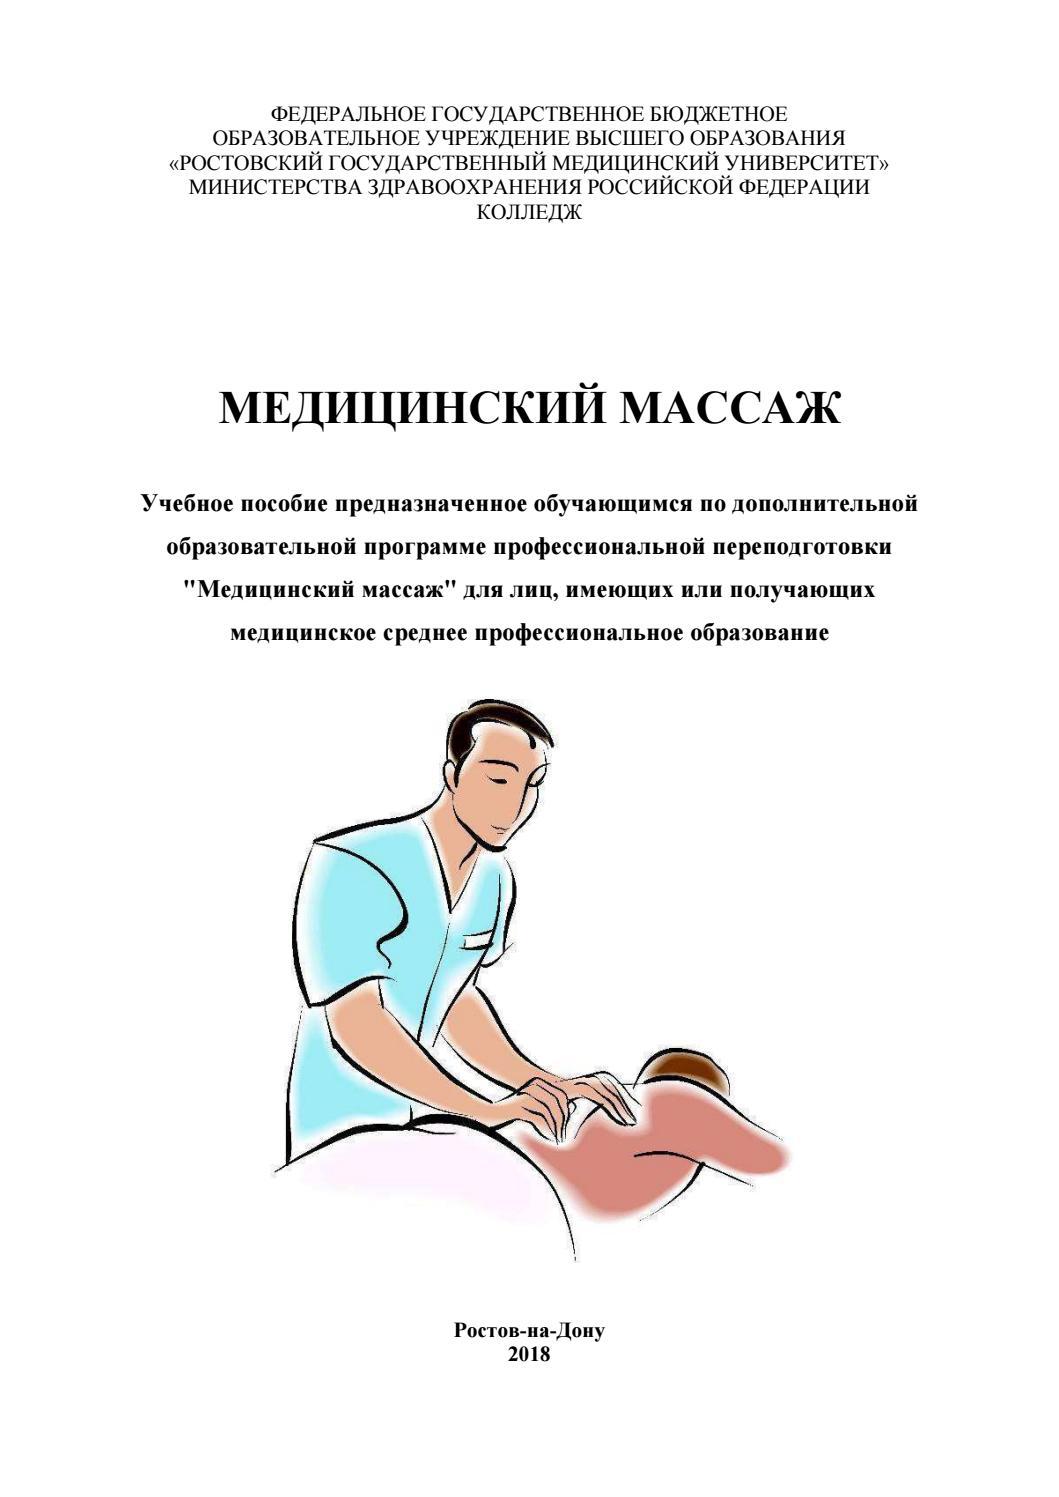 Признаки и лечение простатита у мужчин